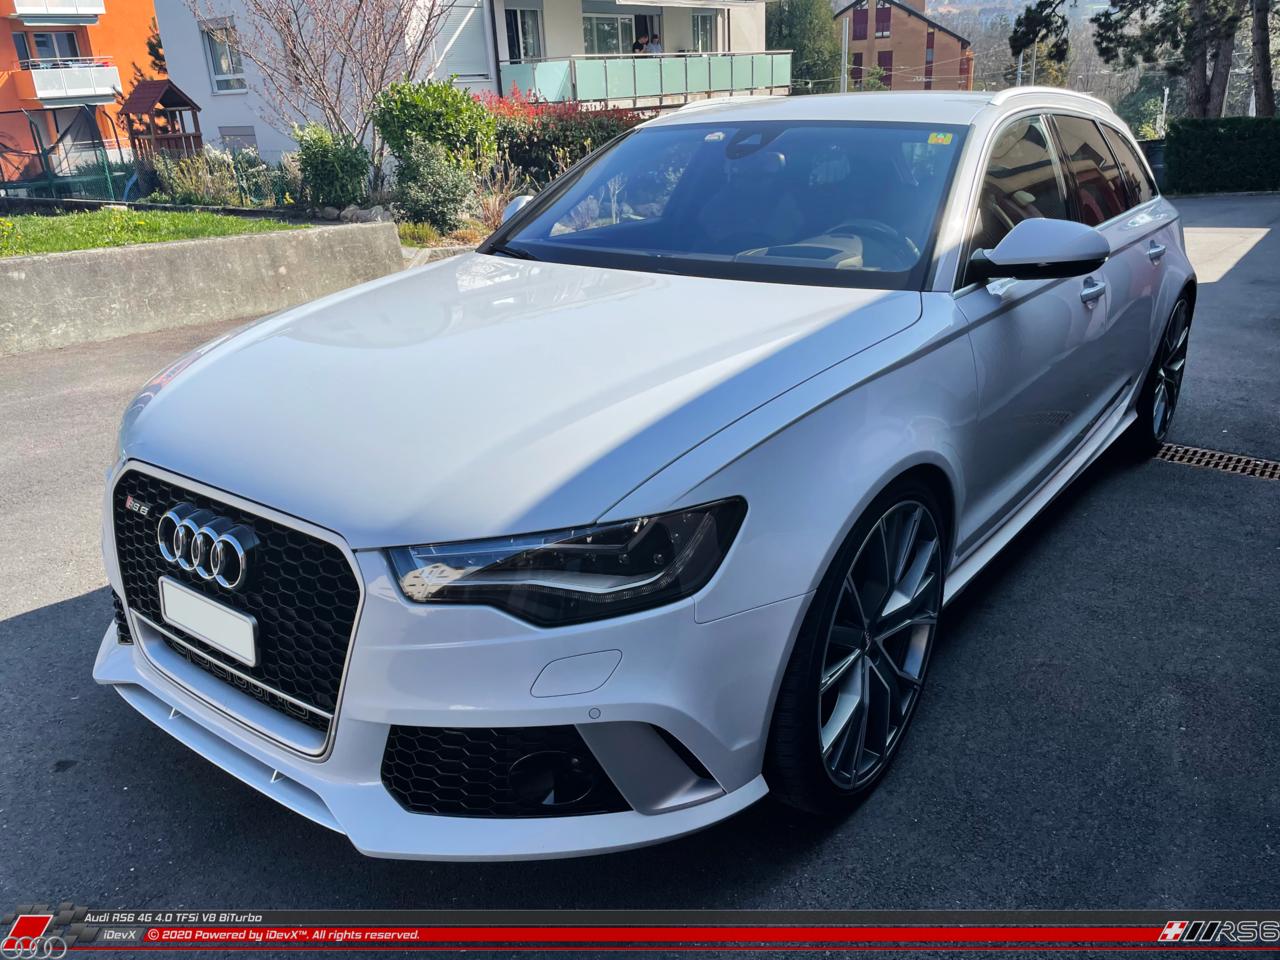 03.04.2021_Audi-RS6_iDevX_000.png